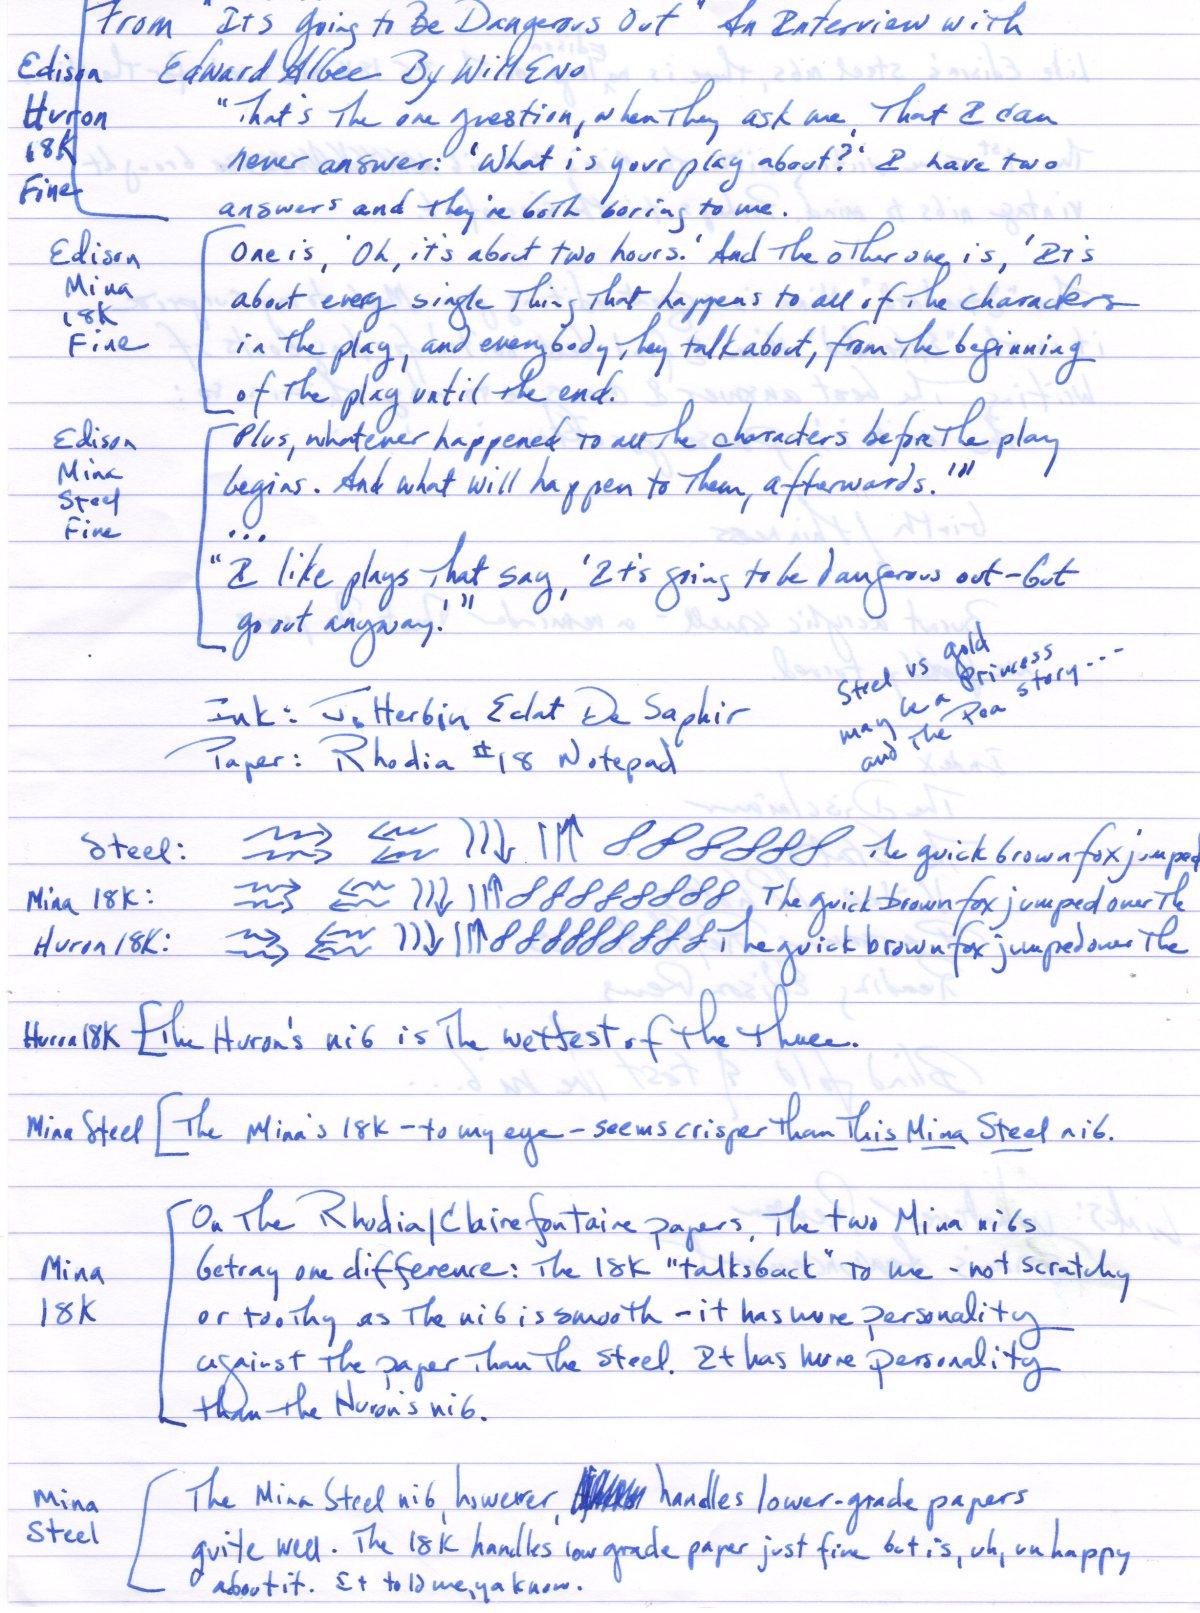 Gold vs Steel nib write-out